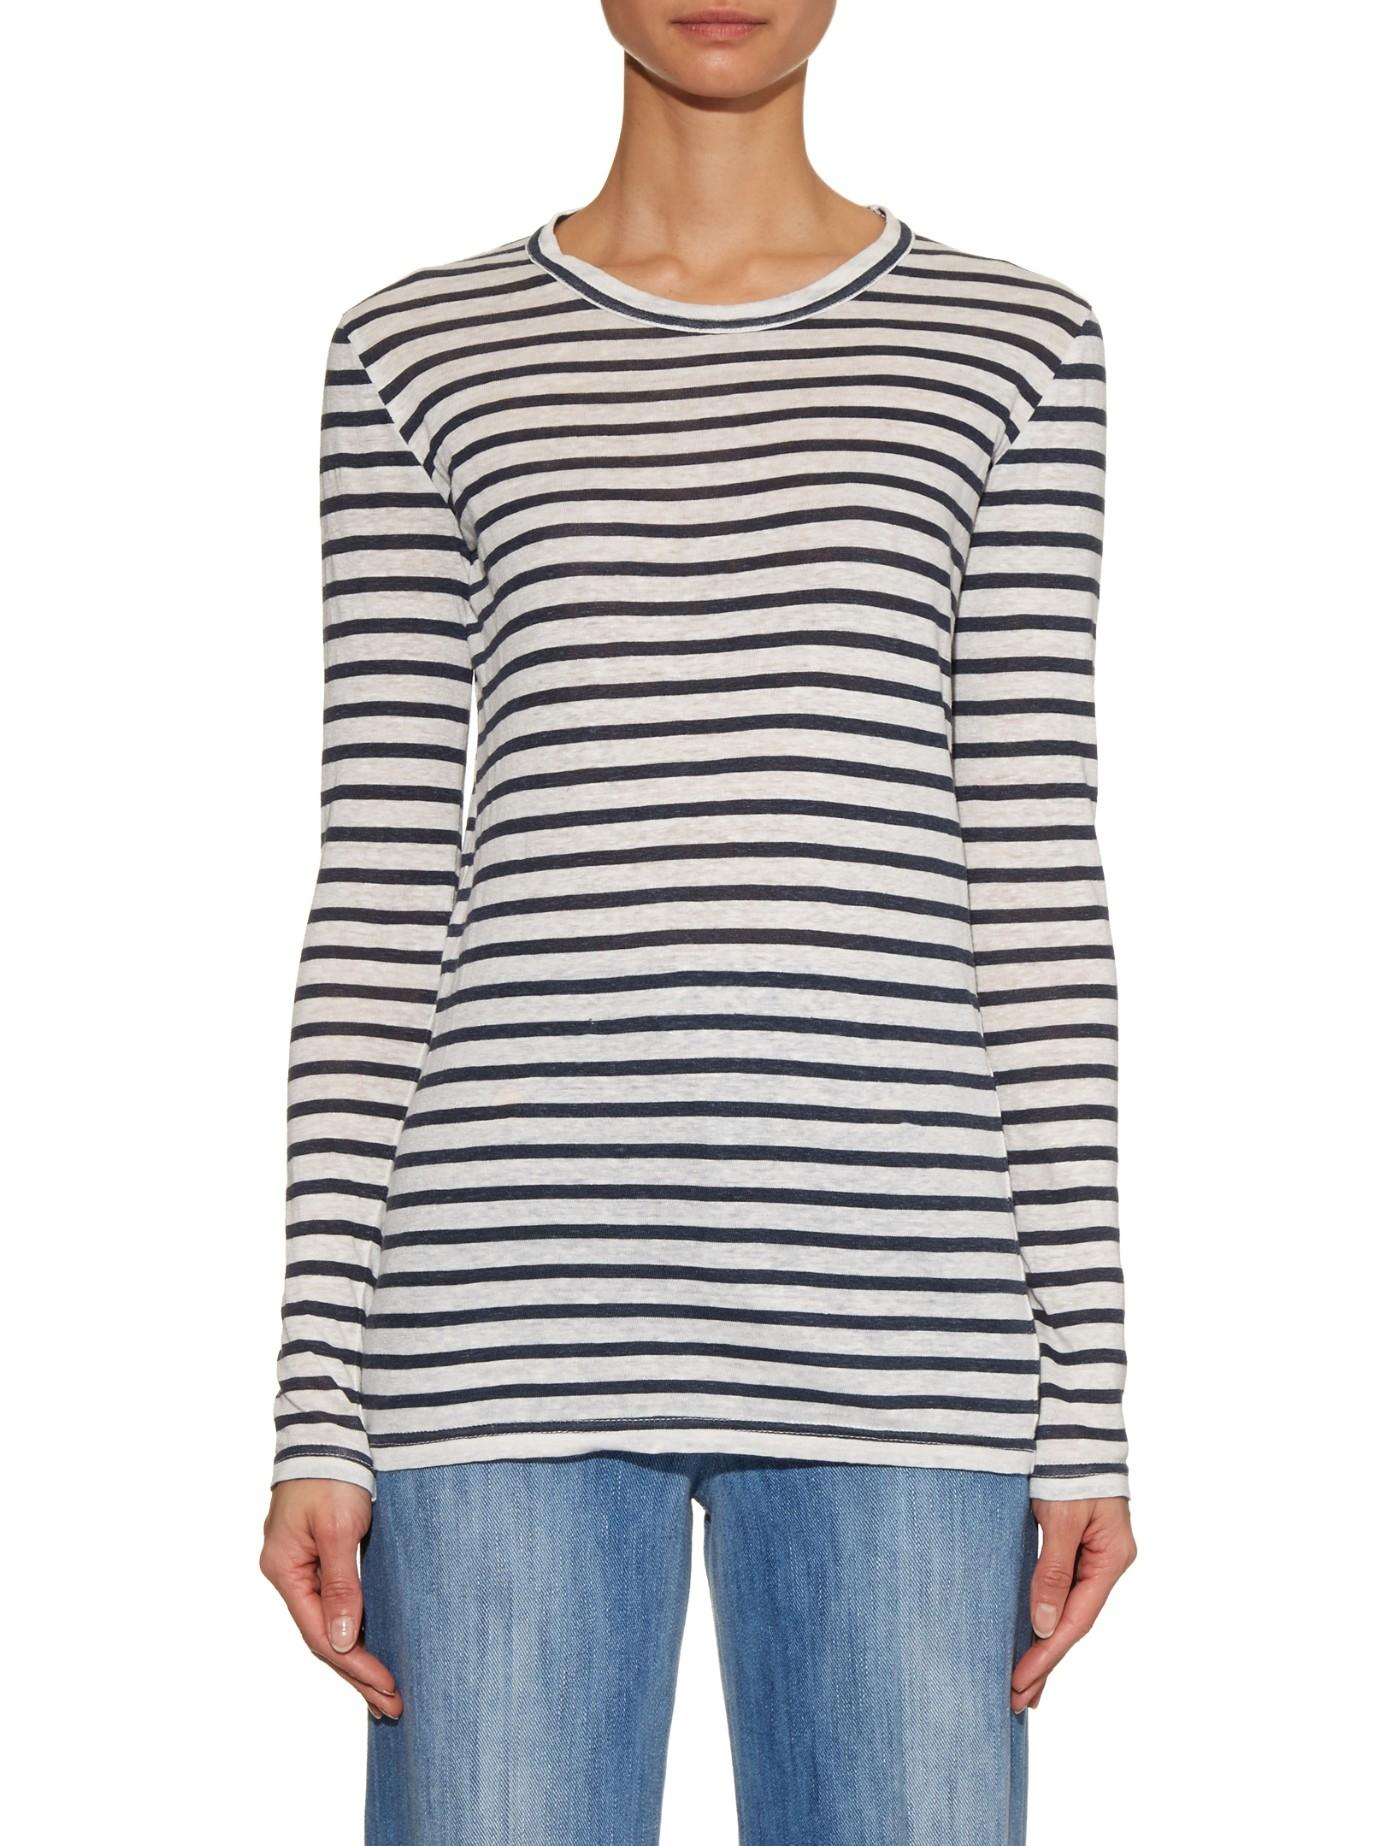 99282318bed13 Étoile Isabel Marant Karon Striped Linen-jersey T-shirt in Black - Lyst